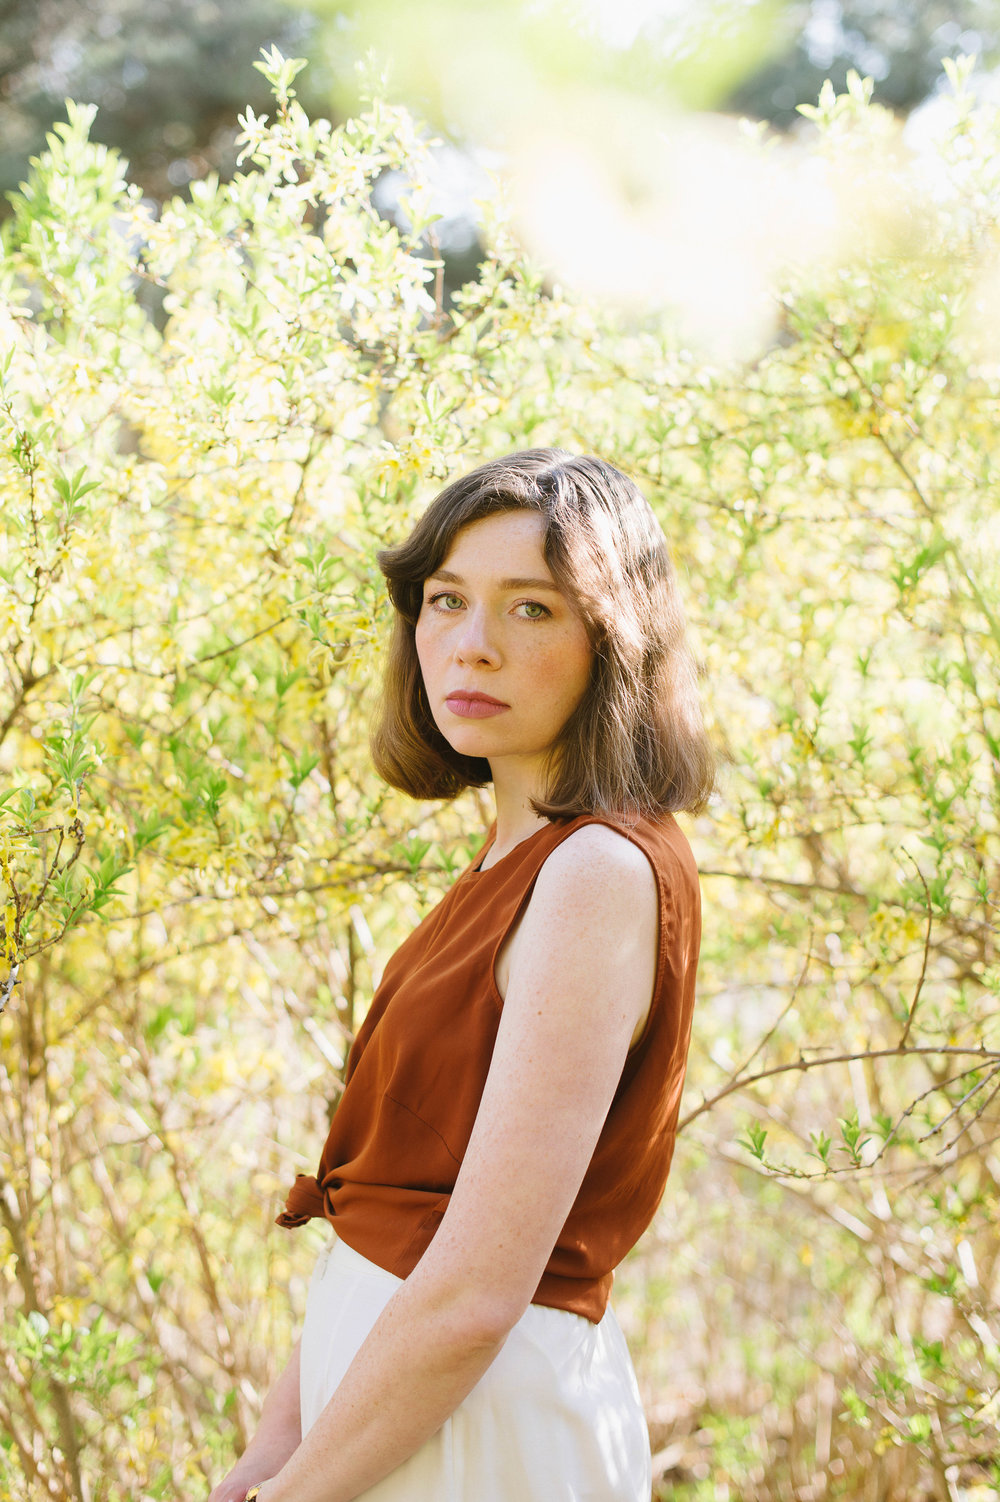 Celine-kim-photography-toronto-portrait-photographer-louise-reimer1.jpg